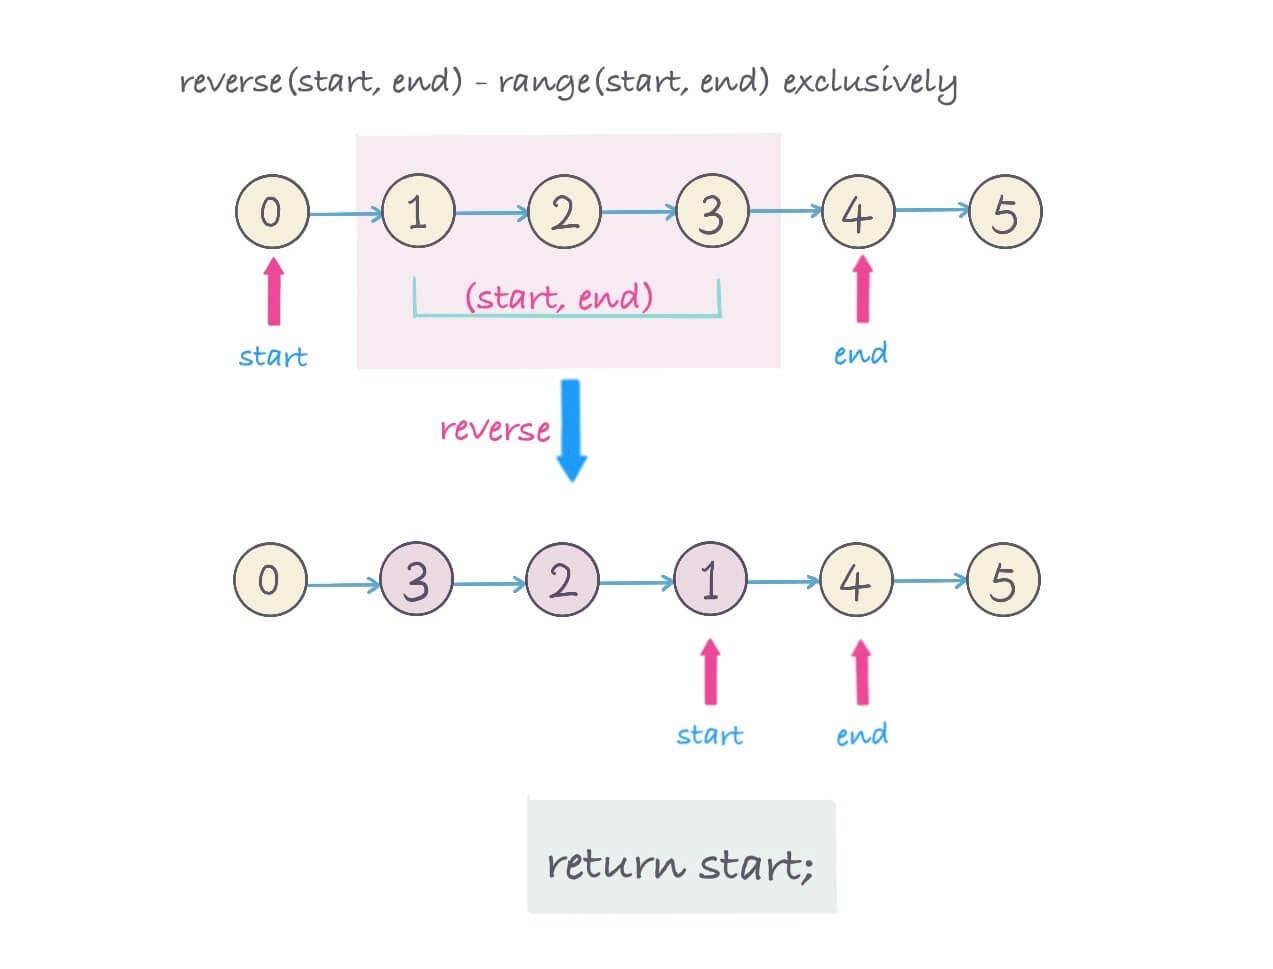 reverse k nodes in linked list